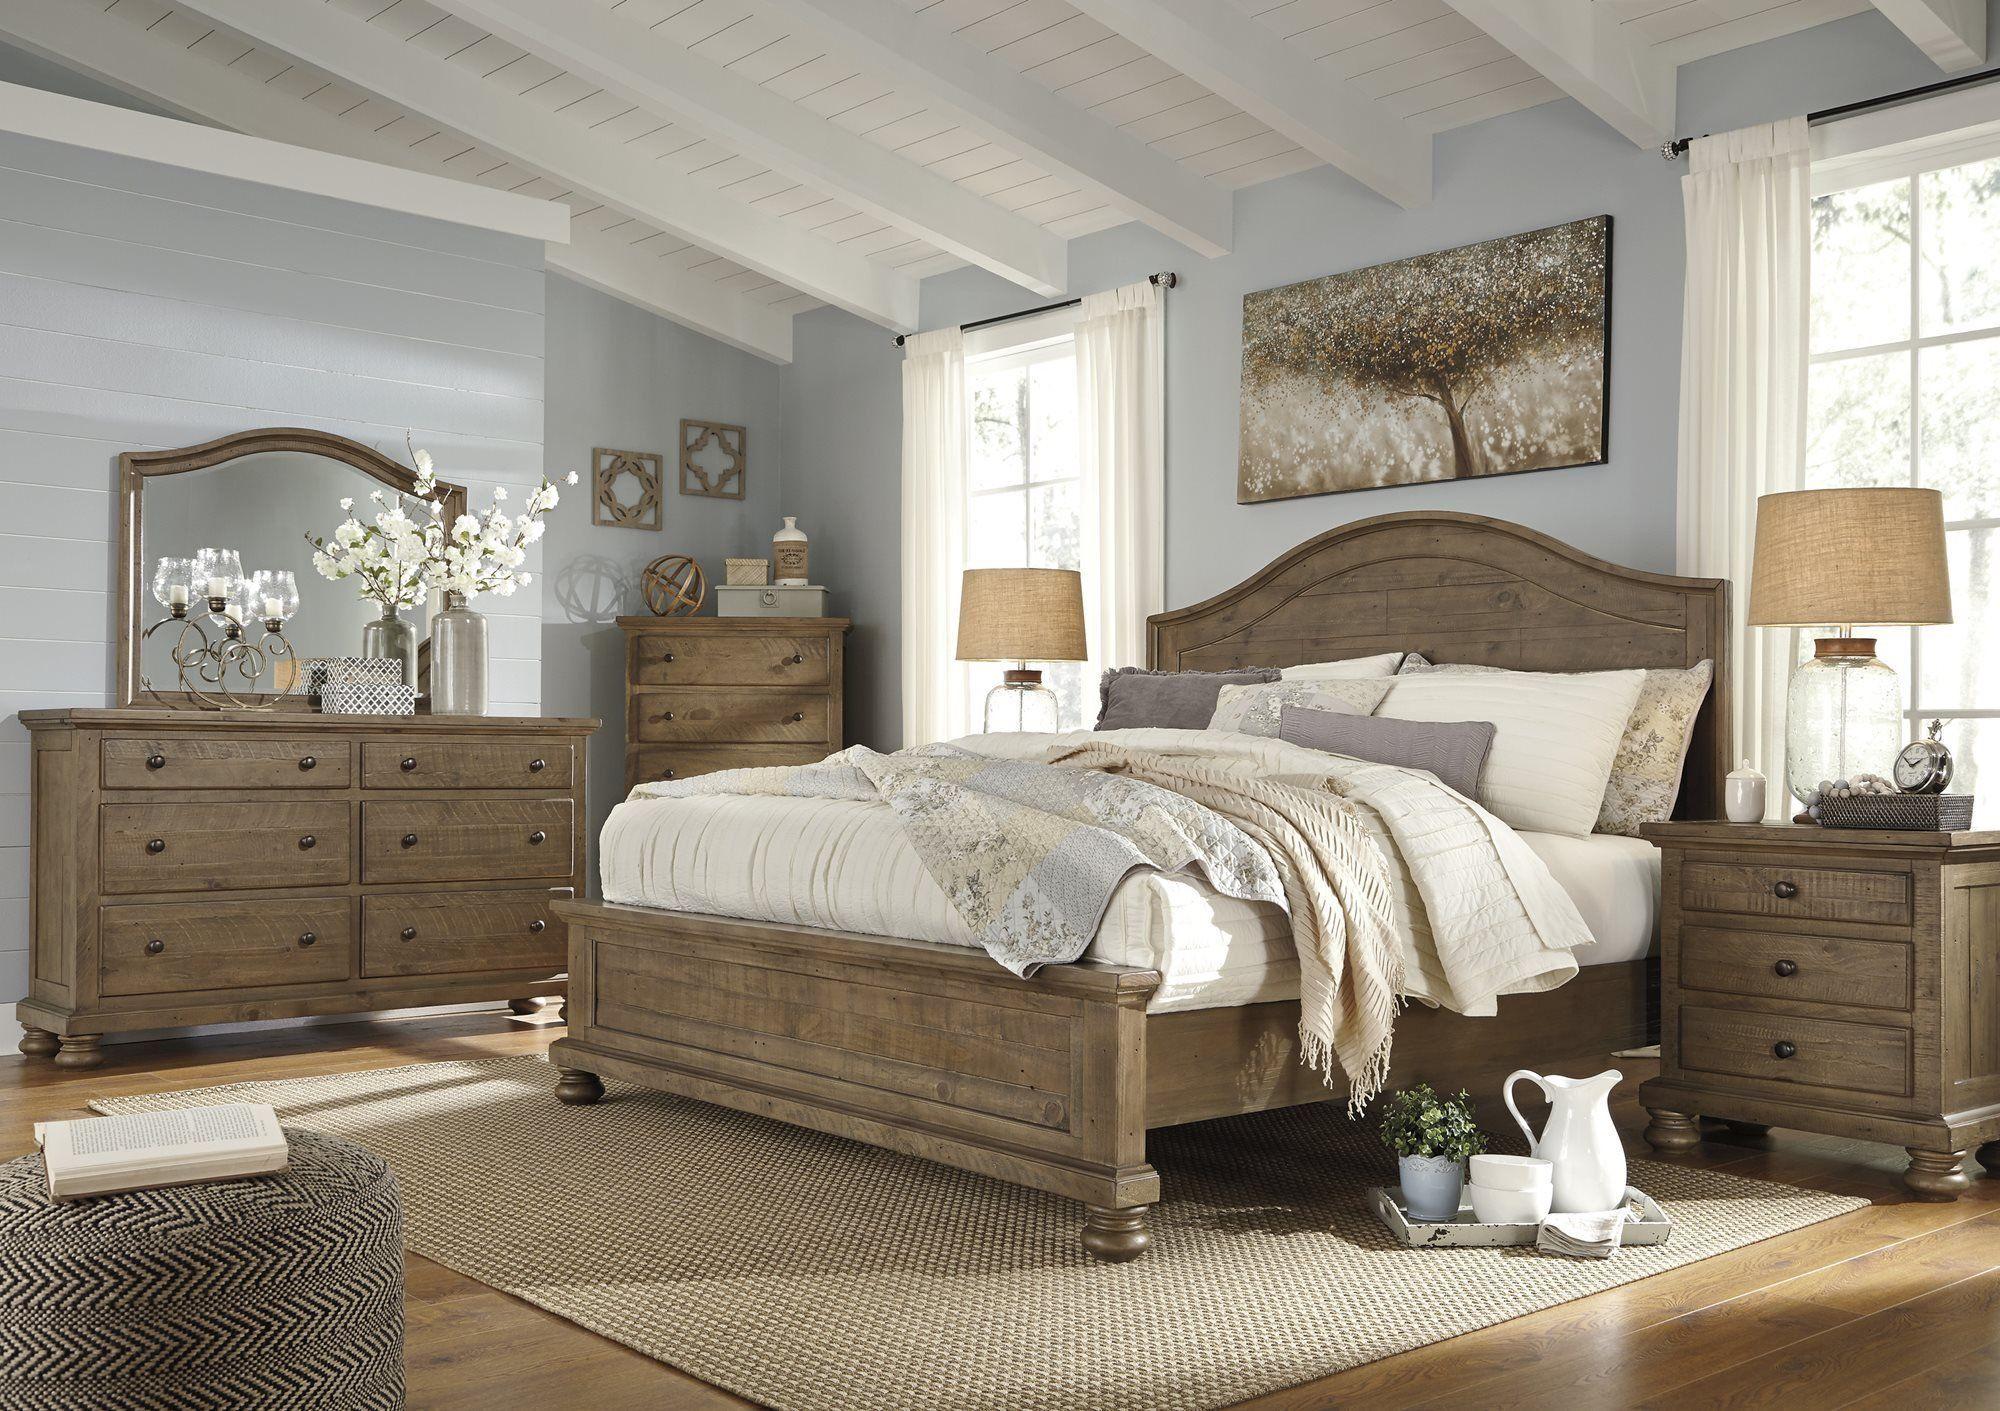 Ashley Trishley 4pc Bedroom Set Queen Panel Bed One Nightstand